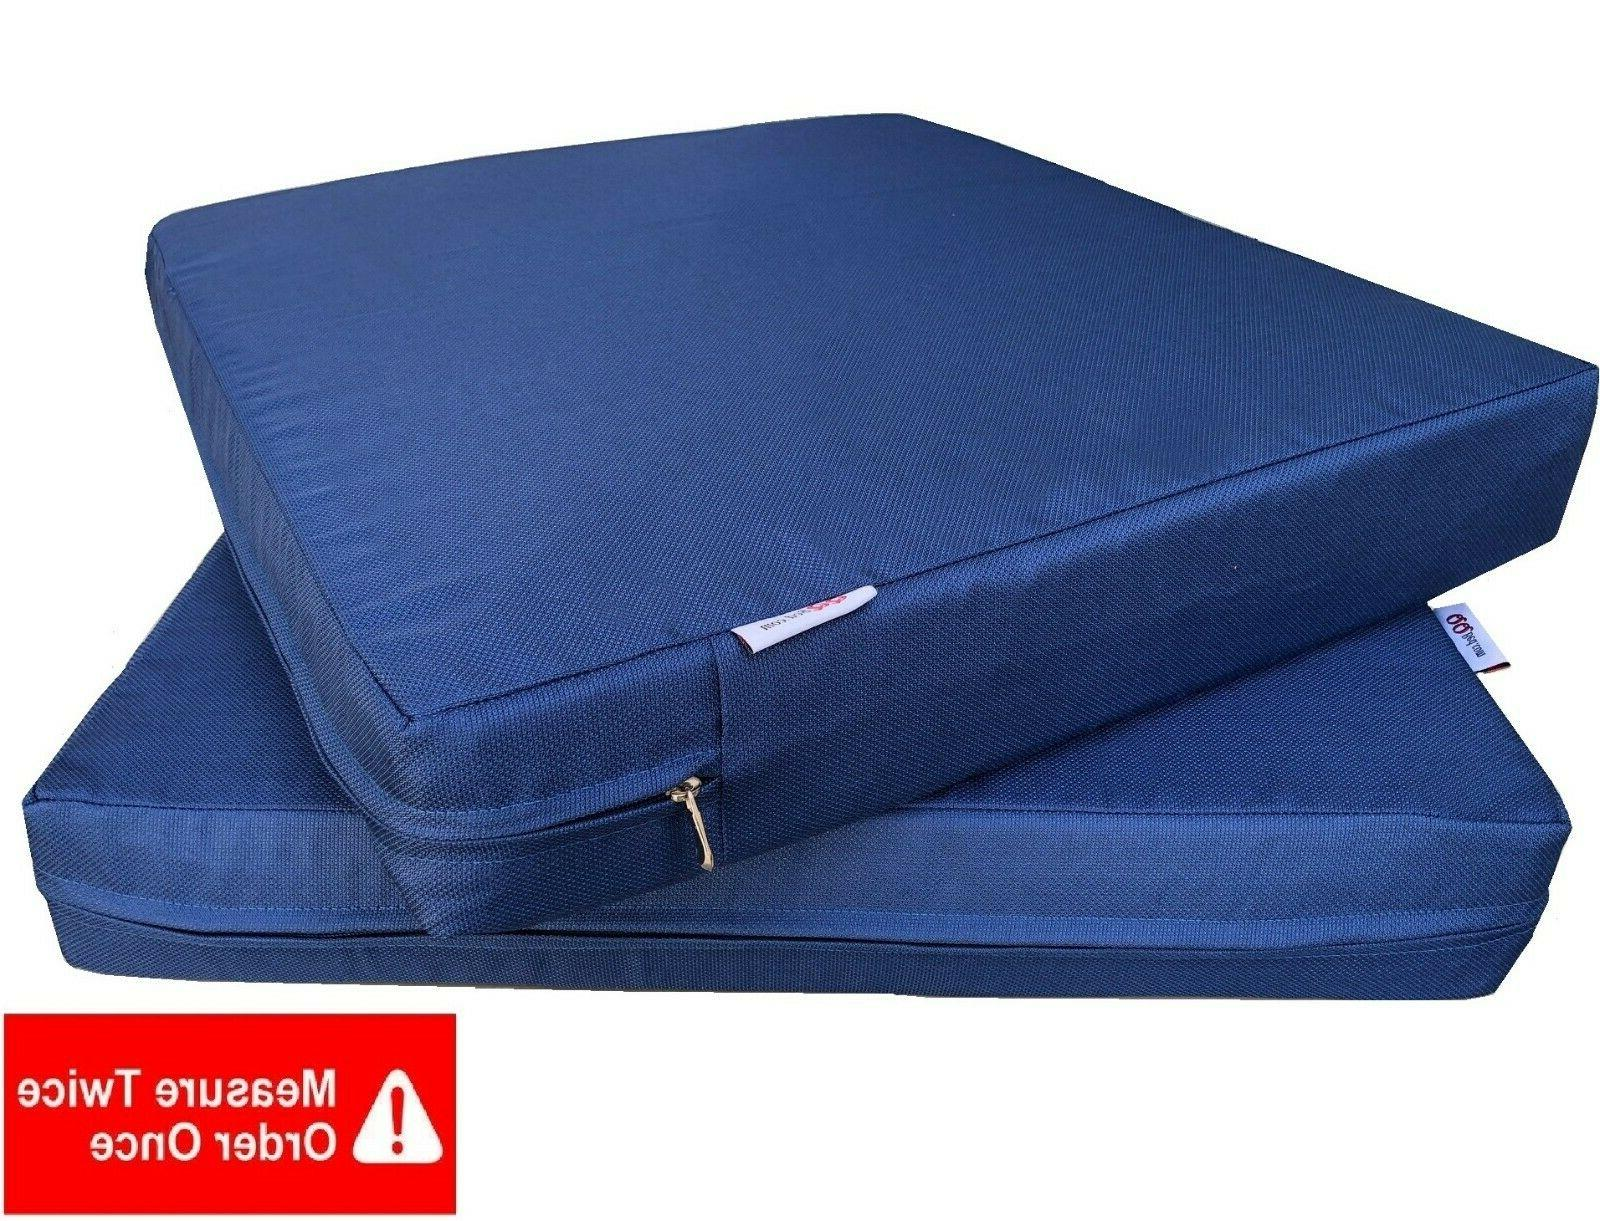 Outdoor 2 Pack Deep Seat Chair Patio Cushions Memory Foam 24